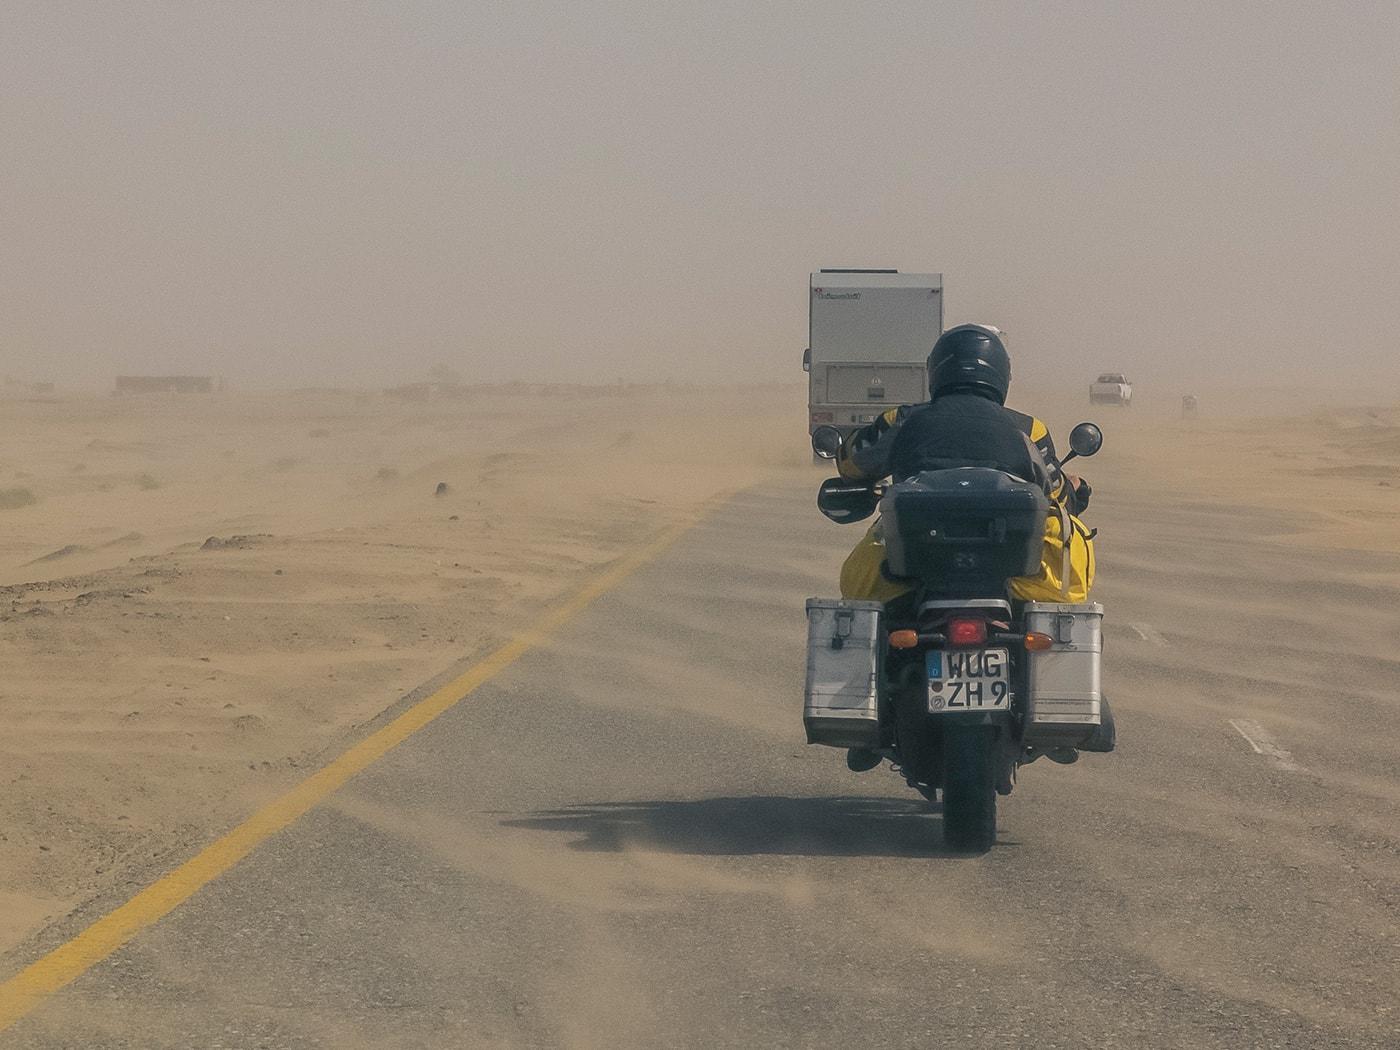 welcome to pakistan strada deserto